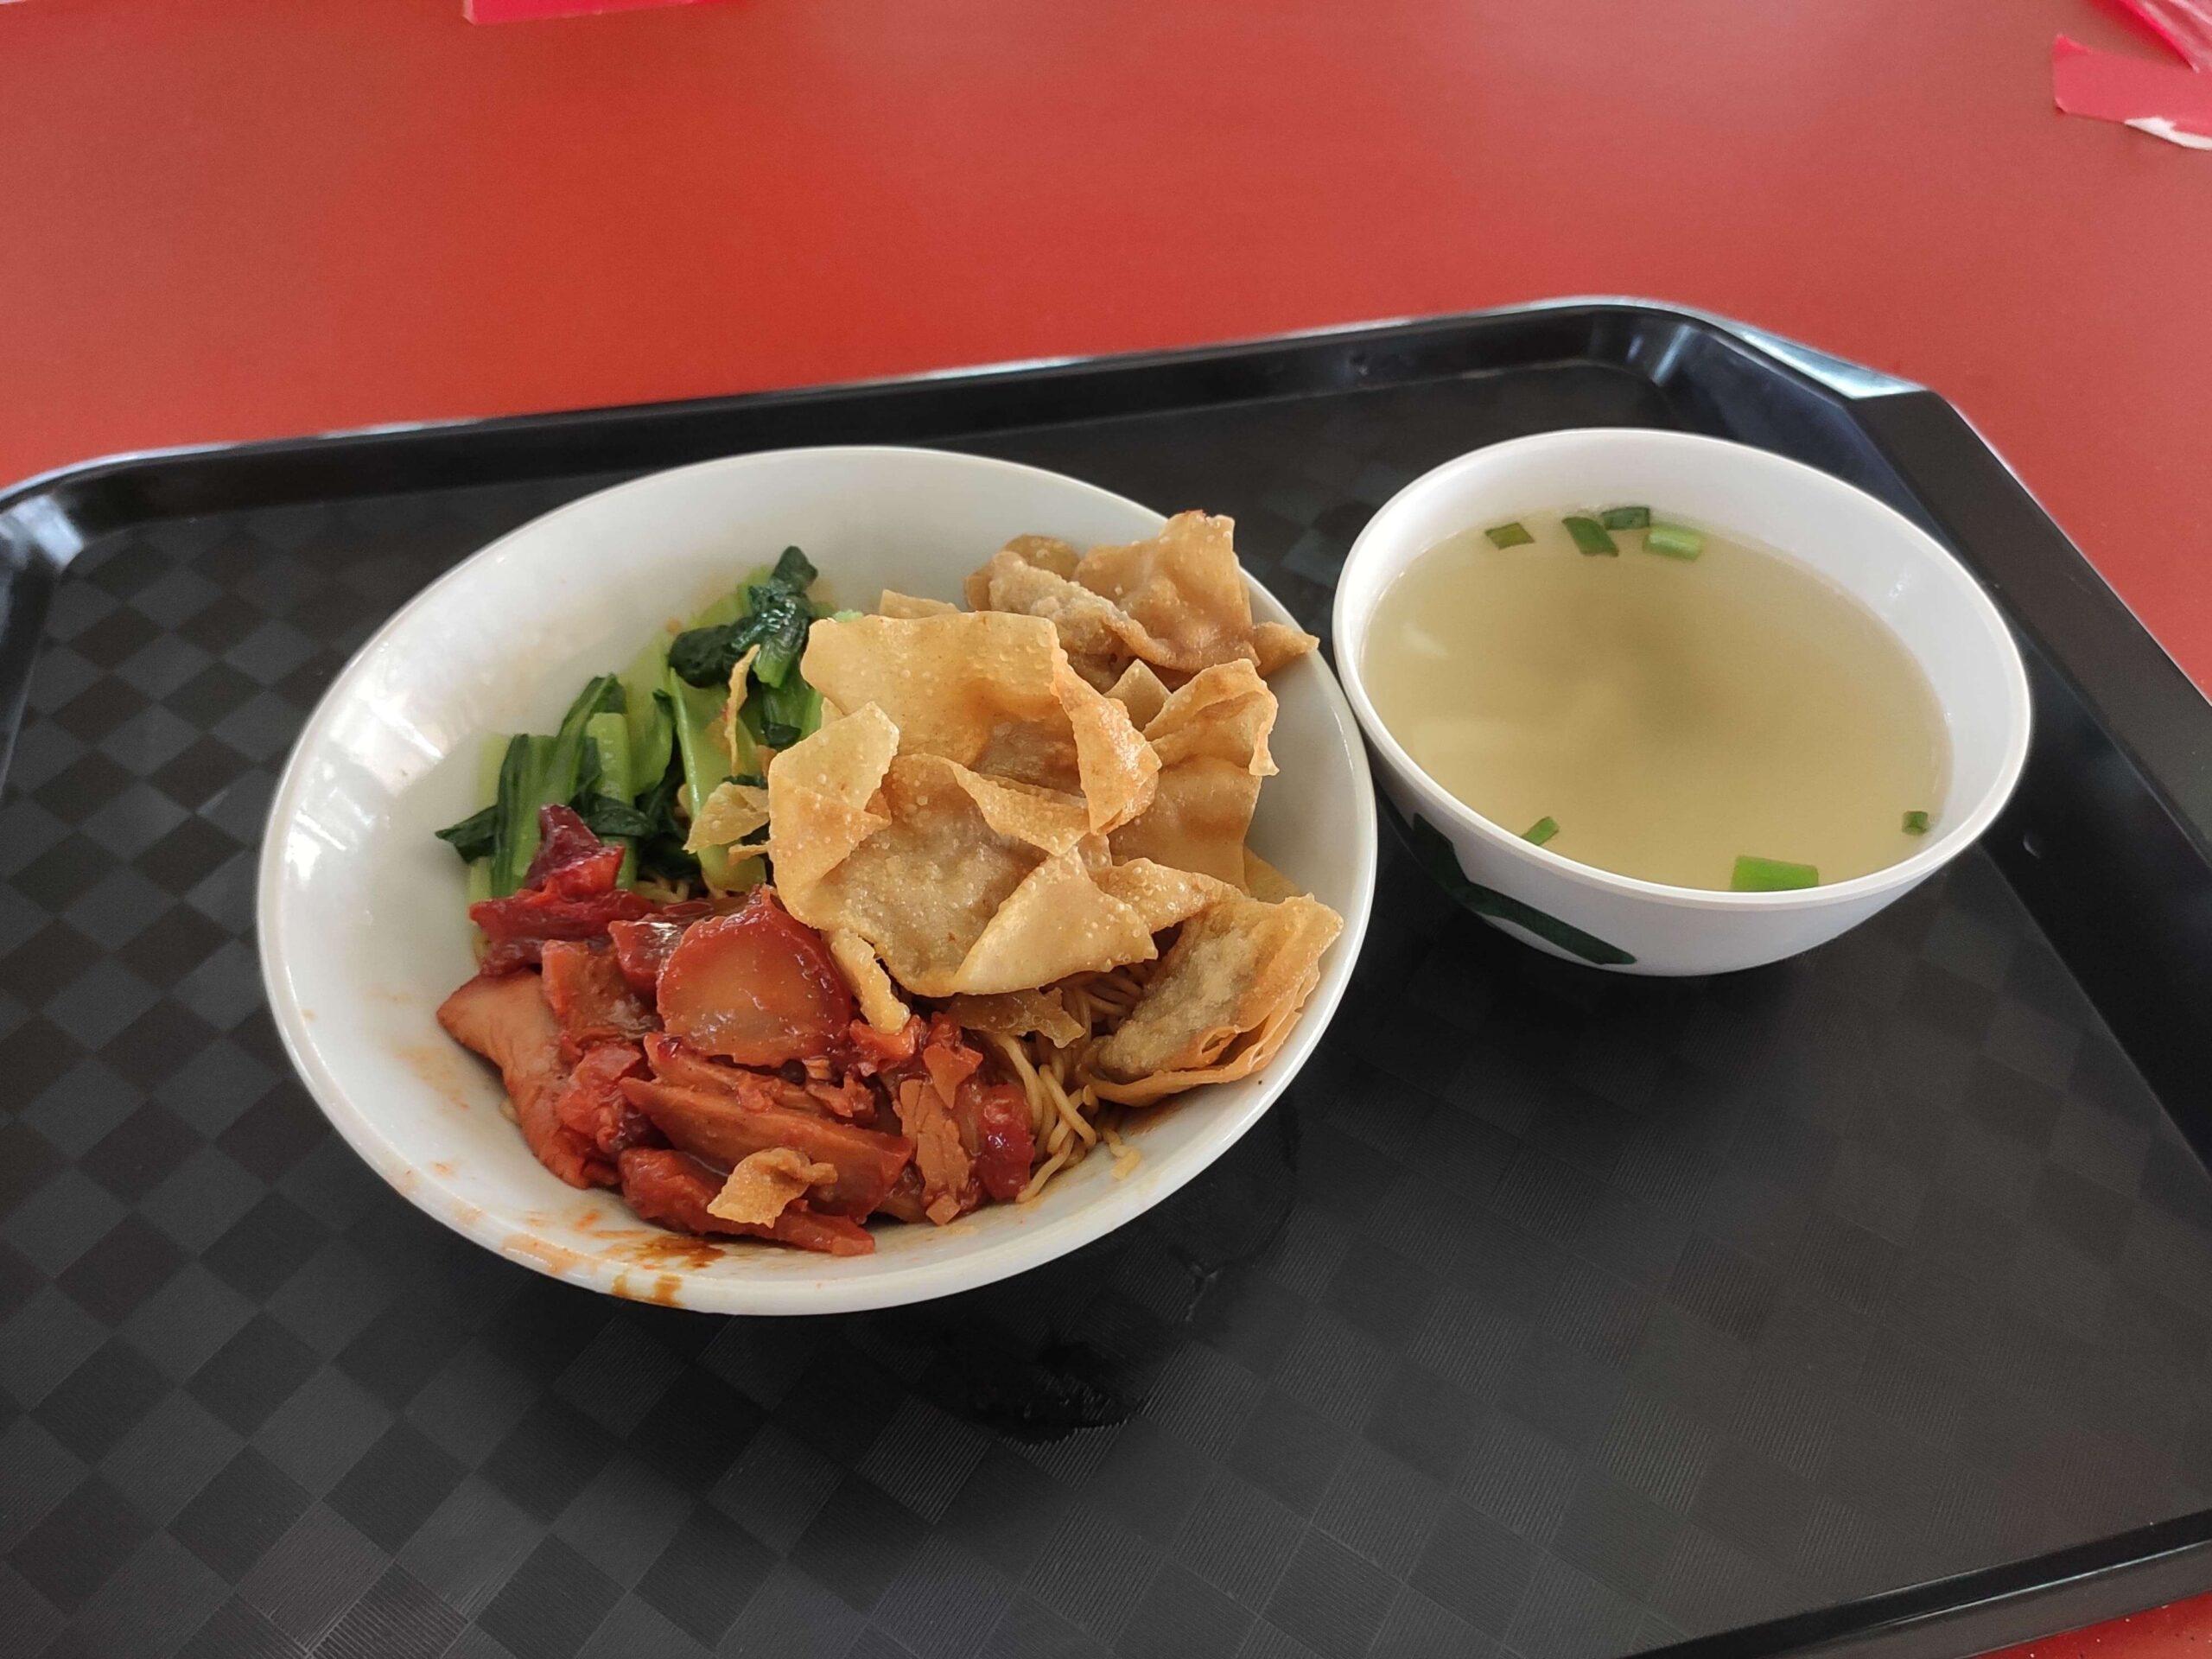 Liang Ji Wanton Noodle: Wanton Mee with Soup